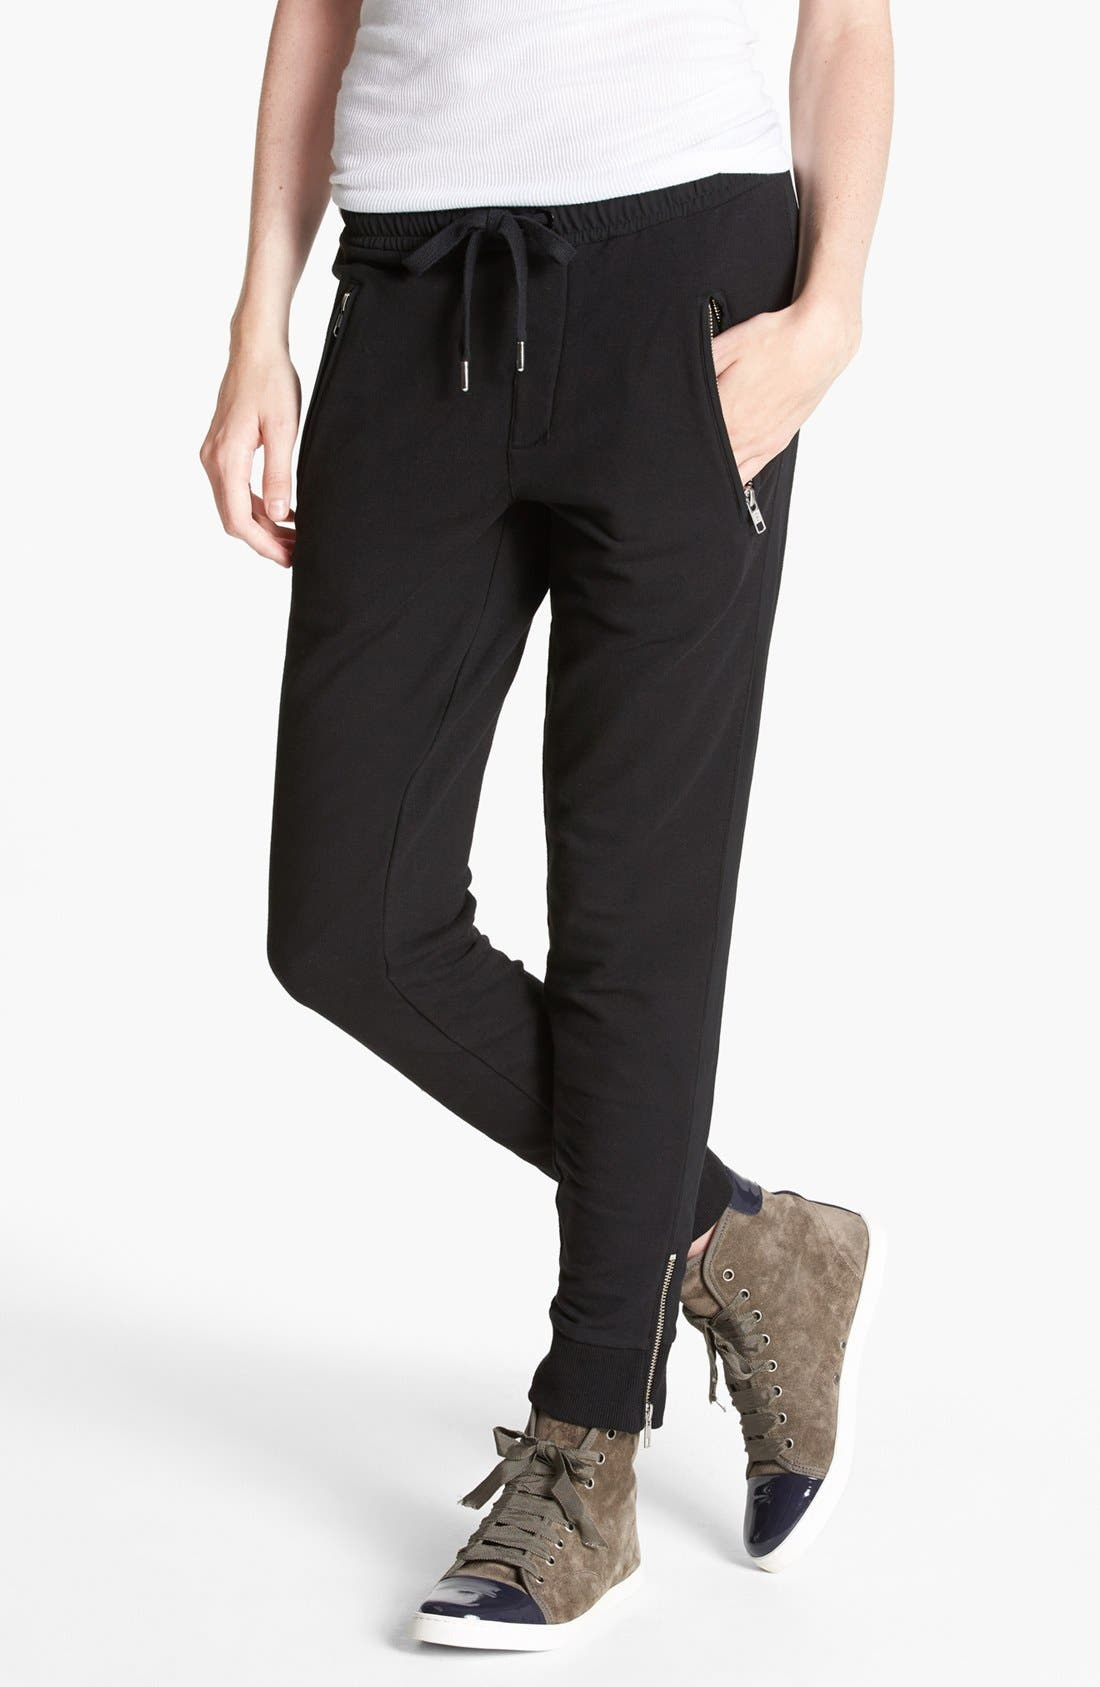 Alternate Image 1 Selected - The Kooples Side Stripe Sweatpants